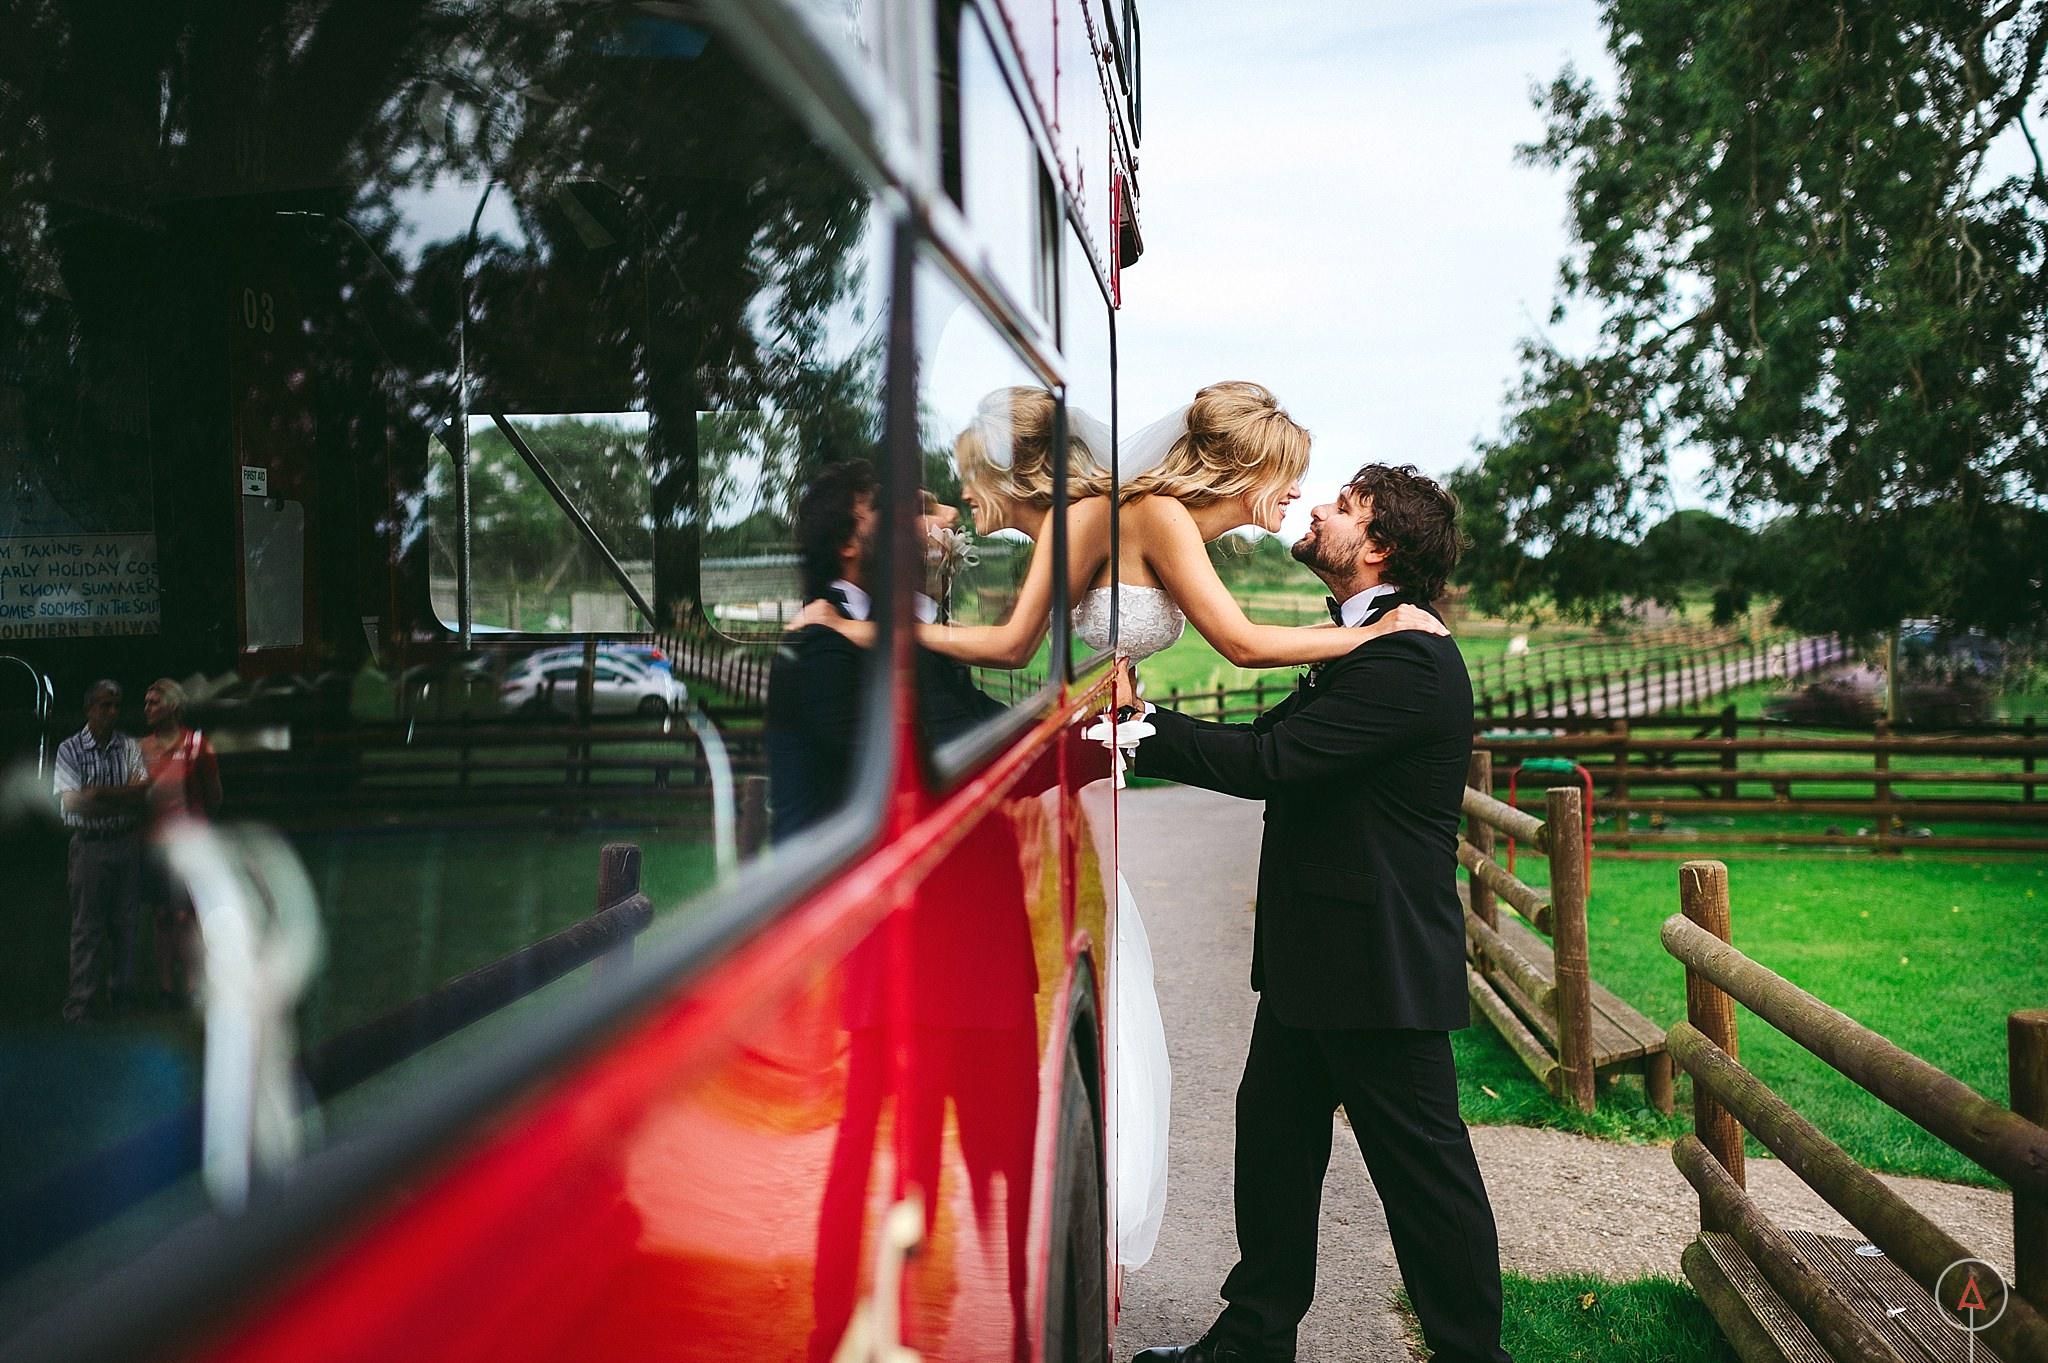 cardiff-wedding-photographer-aga-tomaszek_0384